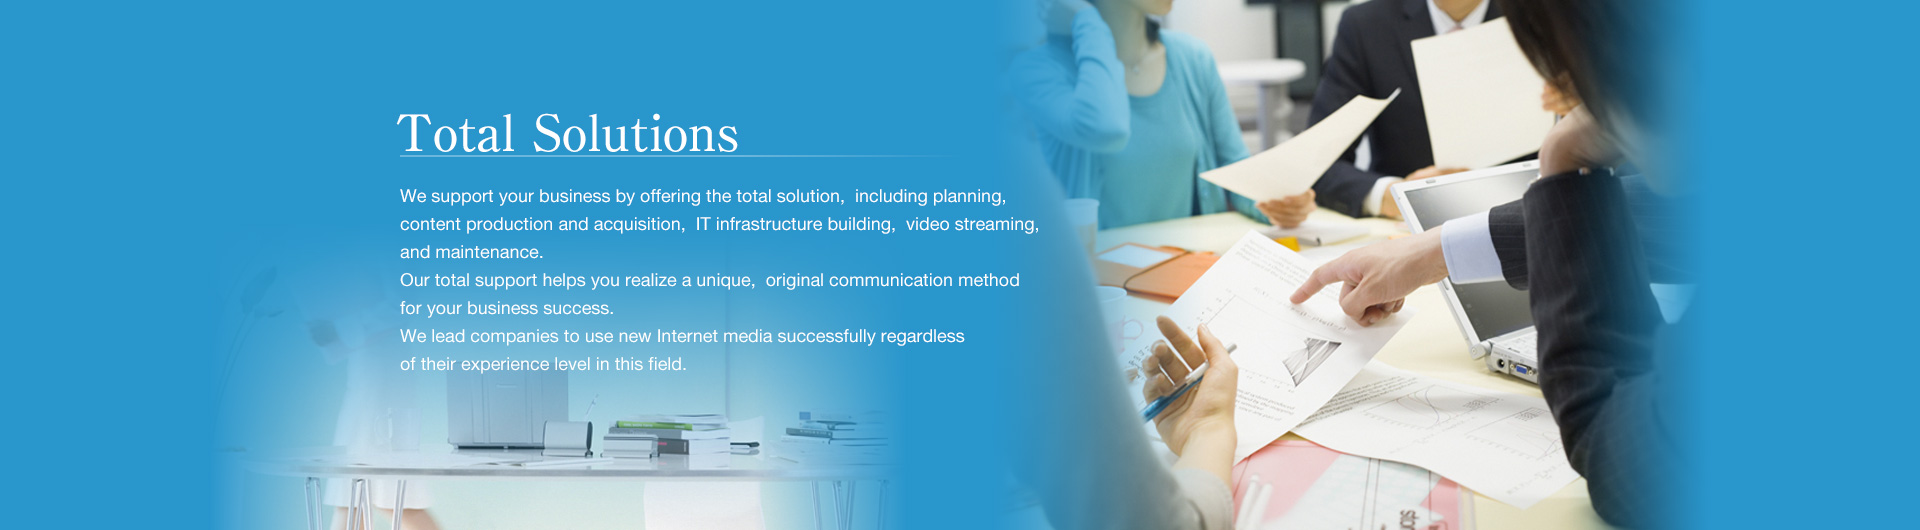 WORLD BIZNet Business Communication x Digital Entertainment